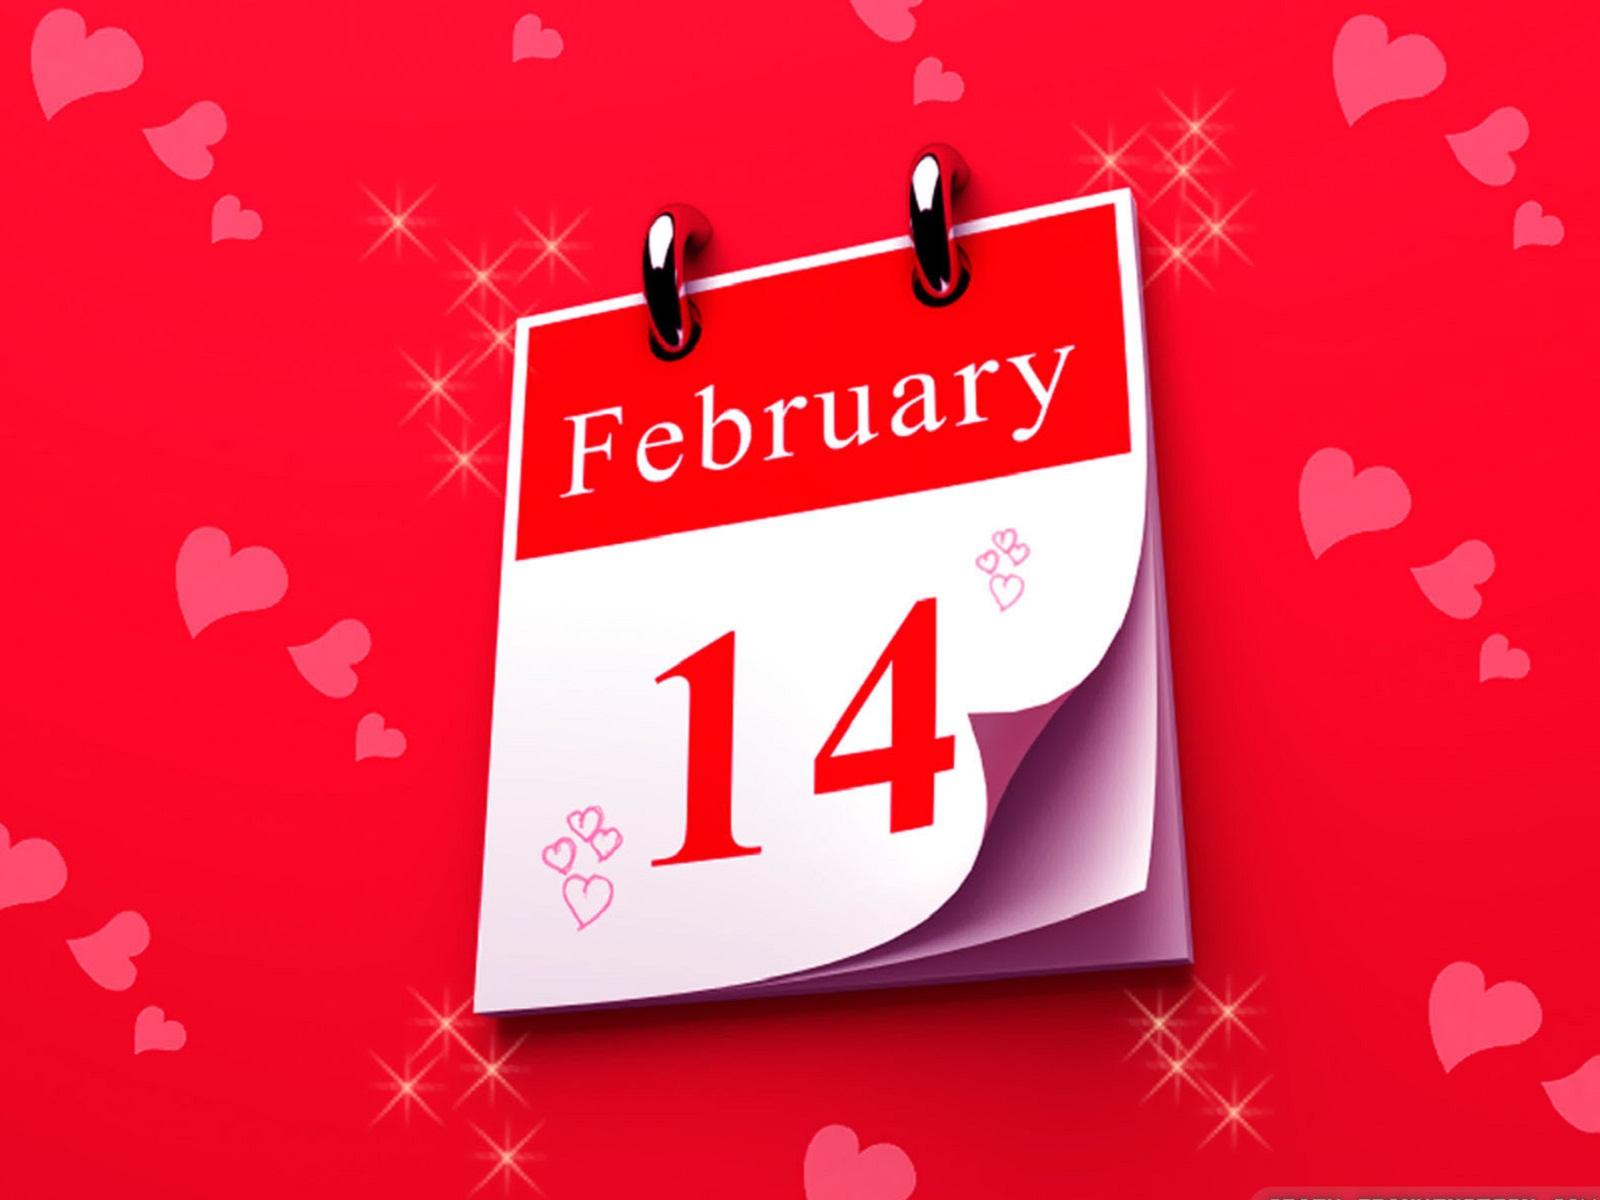 4k Ultra Wallpaper Hd 14 February Wallpaper Valentine Day For